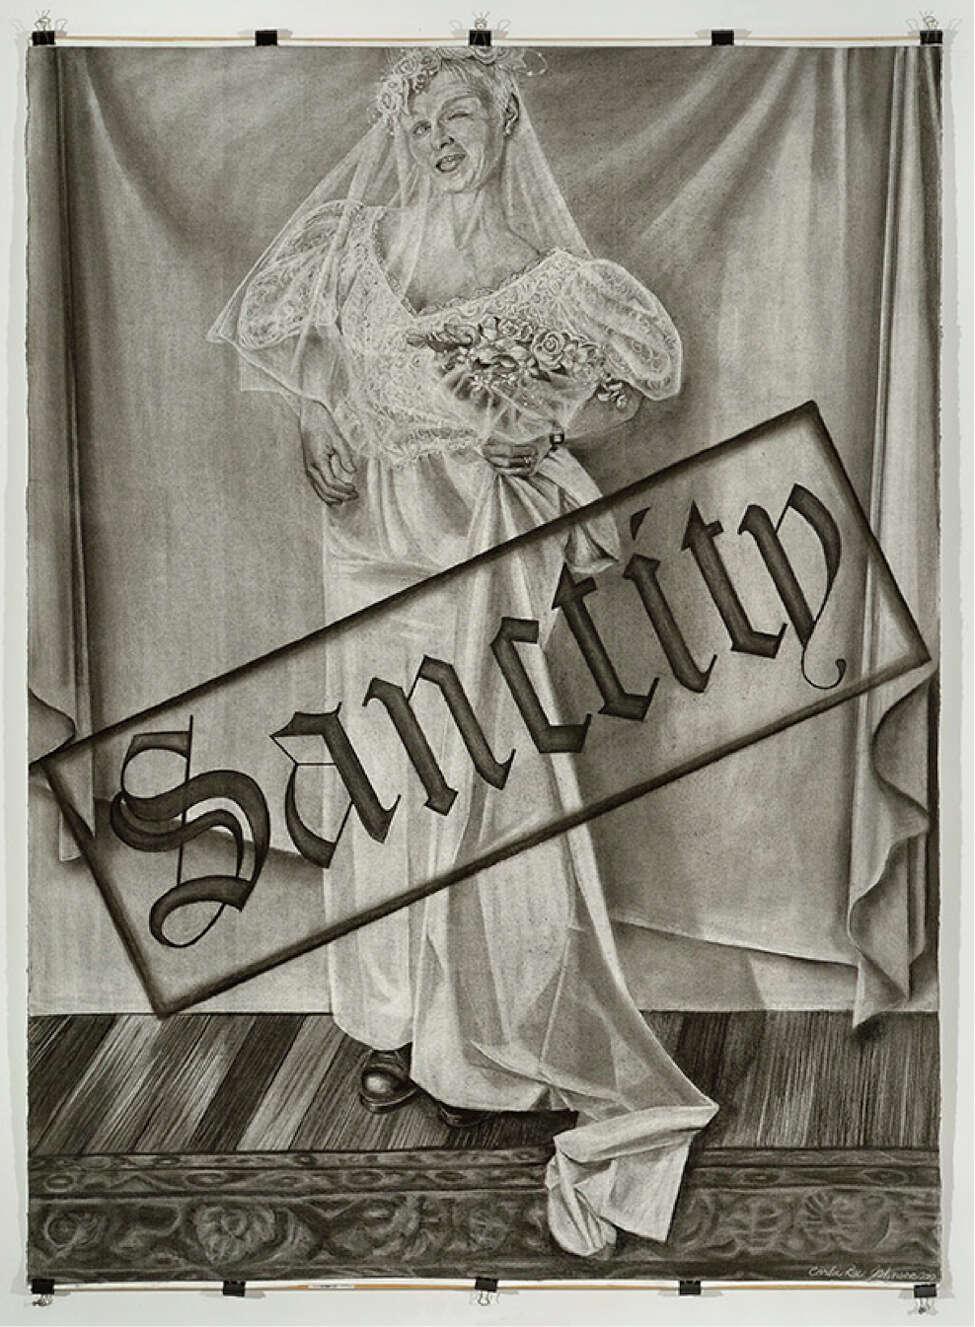 Carla Rae Johnson, Portrait of the Artist as an Arrogant America Series, Sanctity, 2010, charcoal on paper